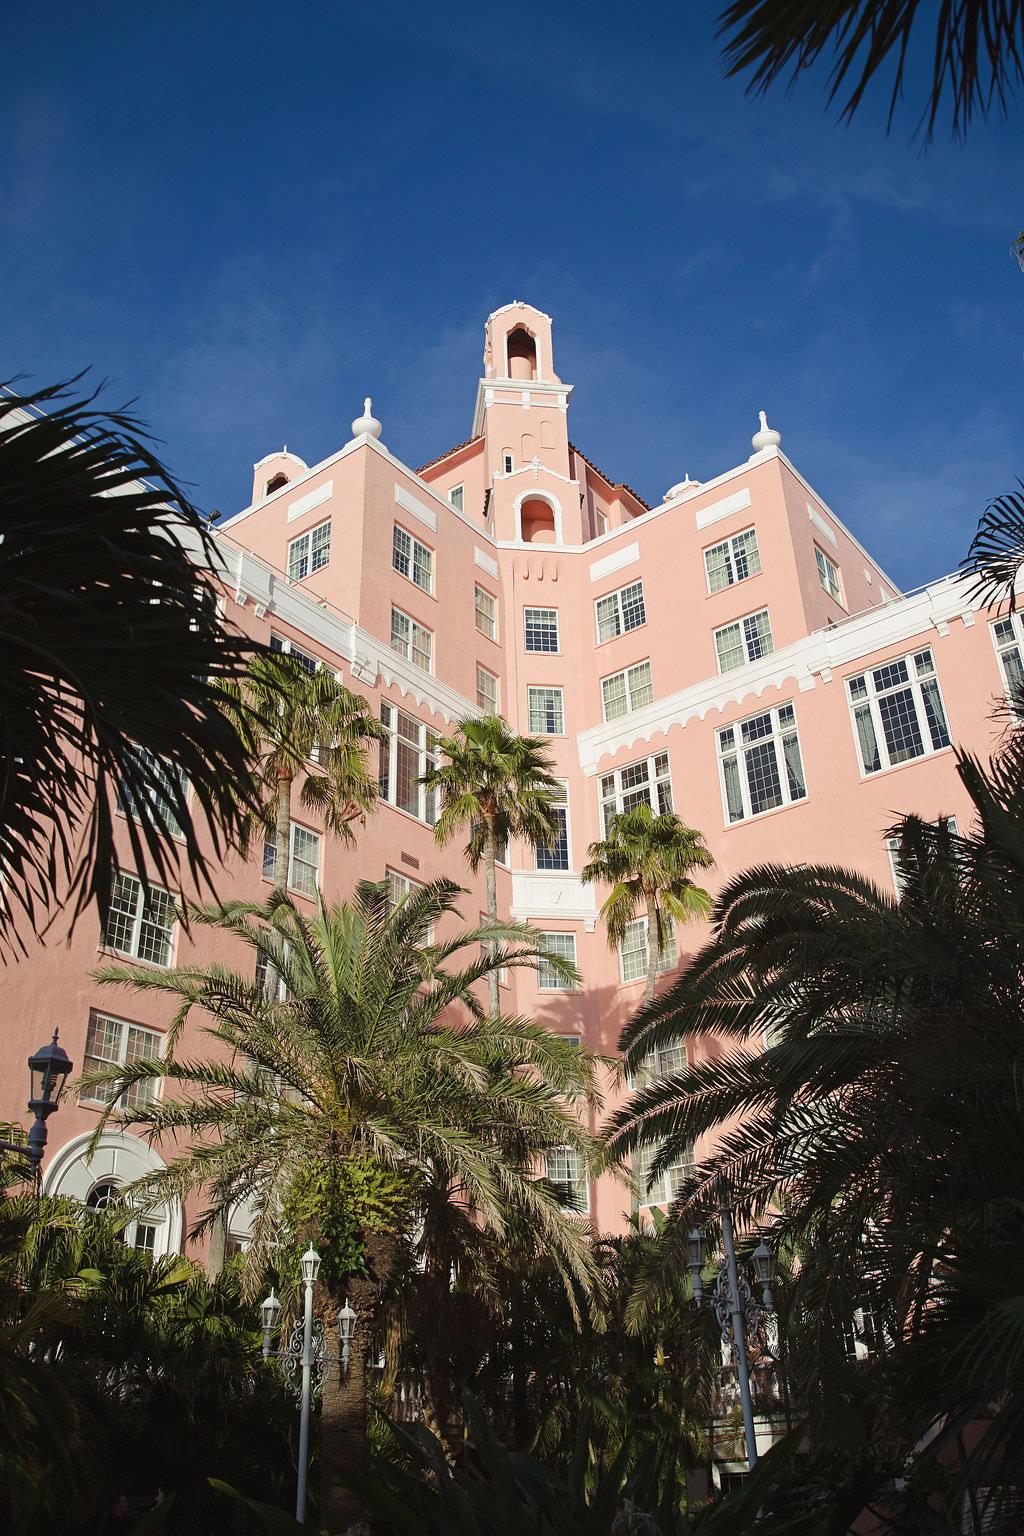 Historic Waterfront Hotel St. Pete Beach Wedding Venue The Don CeSar